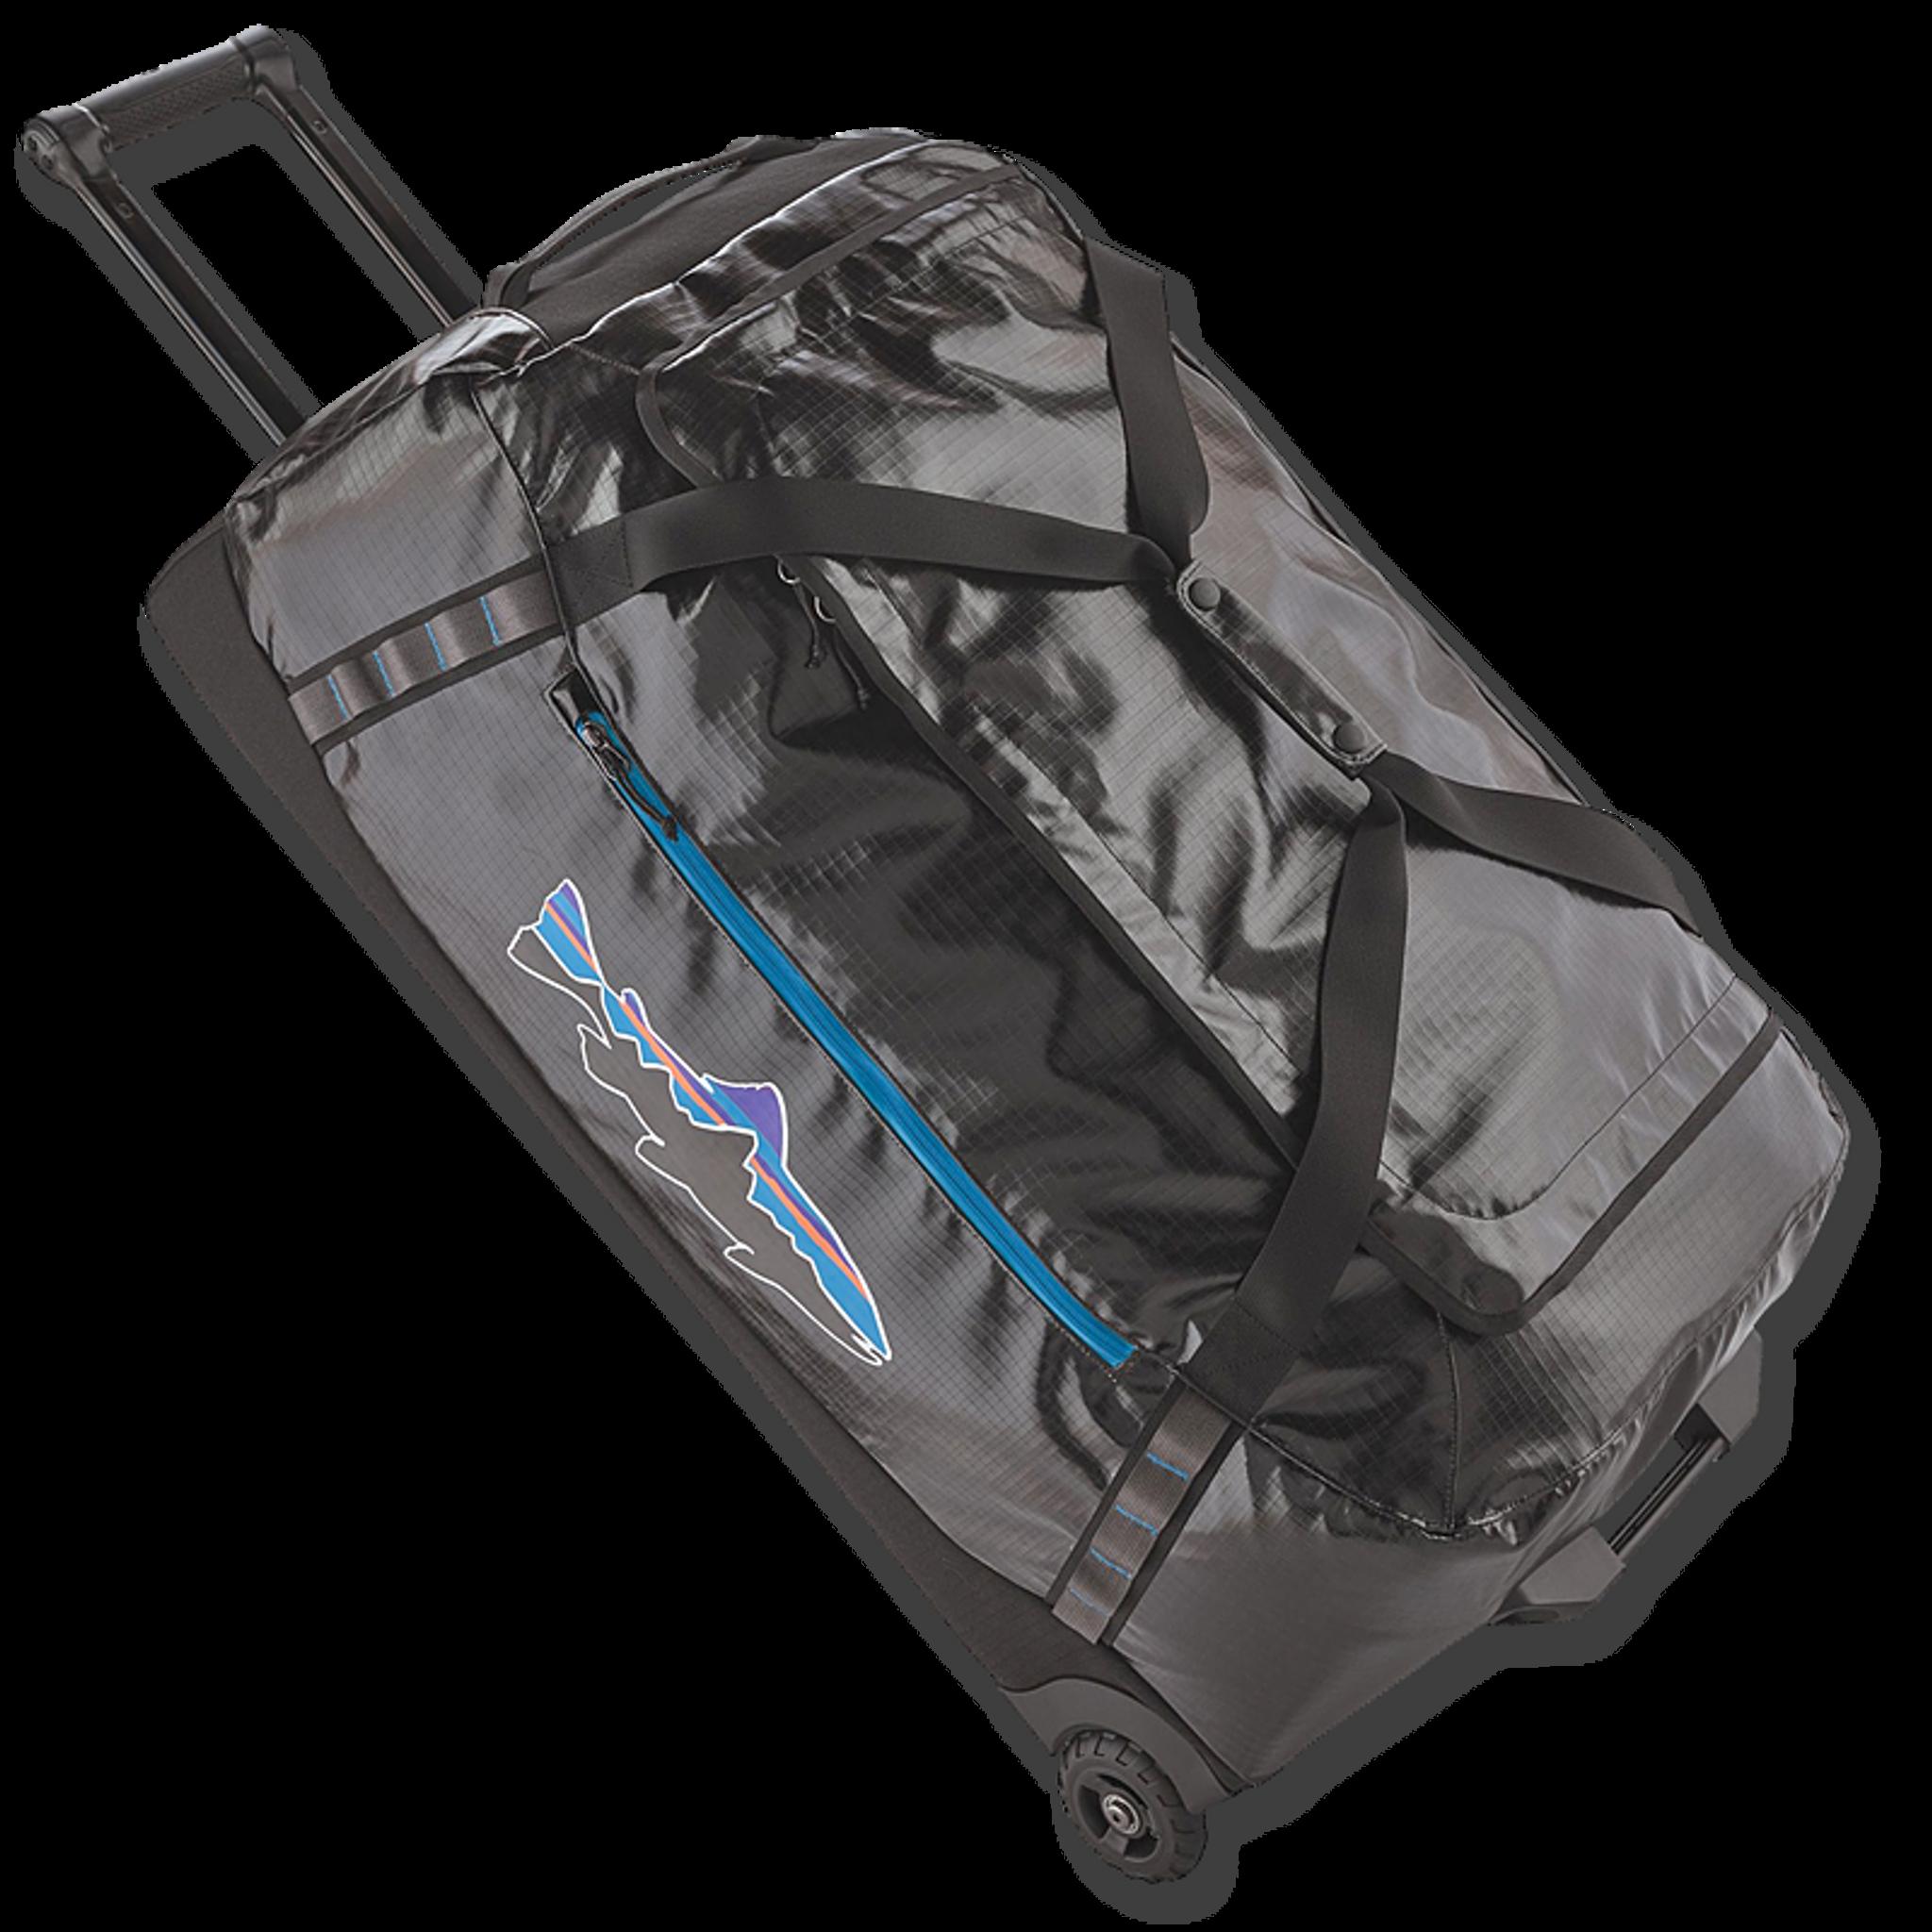 e8ad757cf2c9 Patagonia Black Hole® Wheeled Duffel Bag - Black with Fitz Trout ...